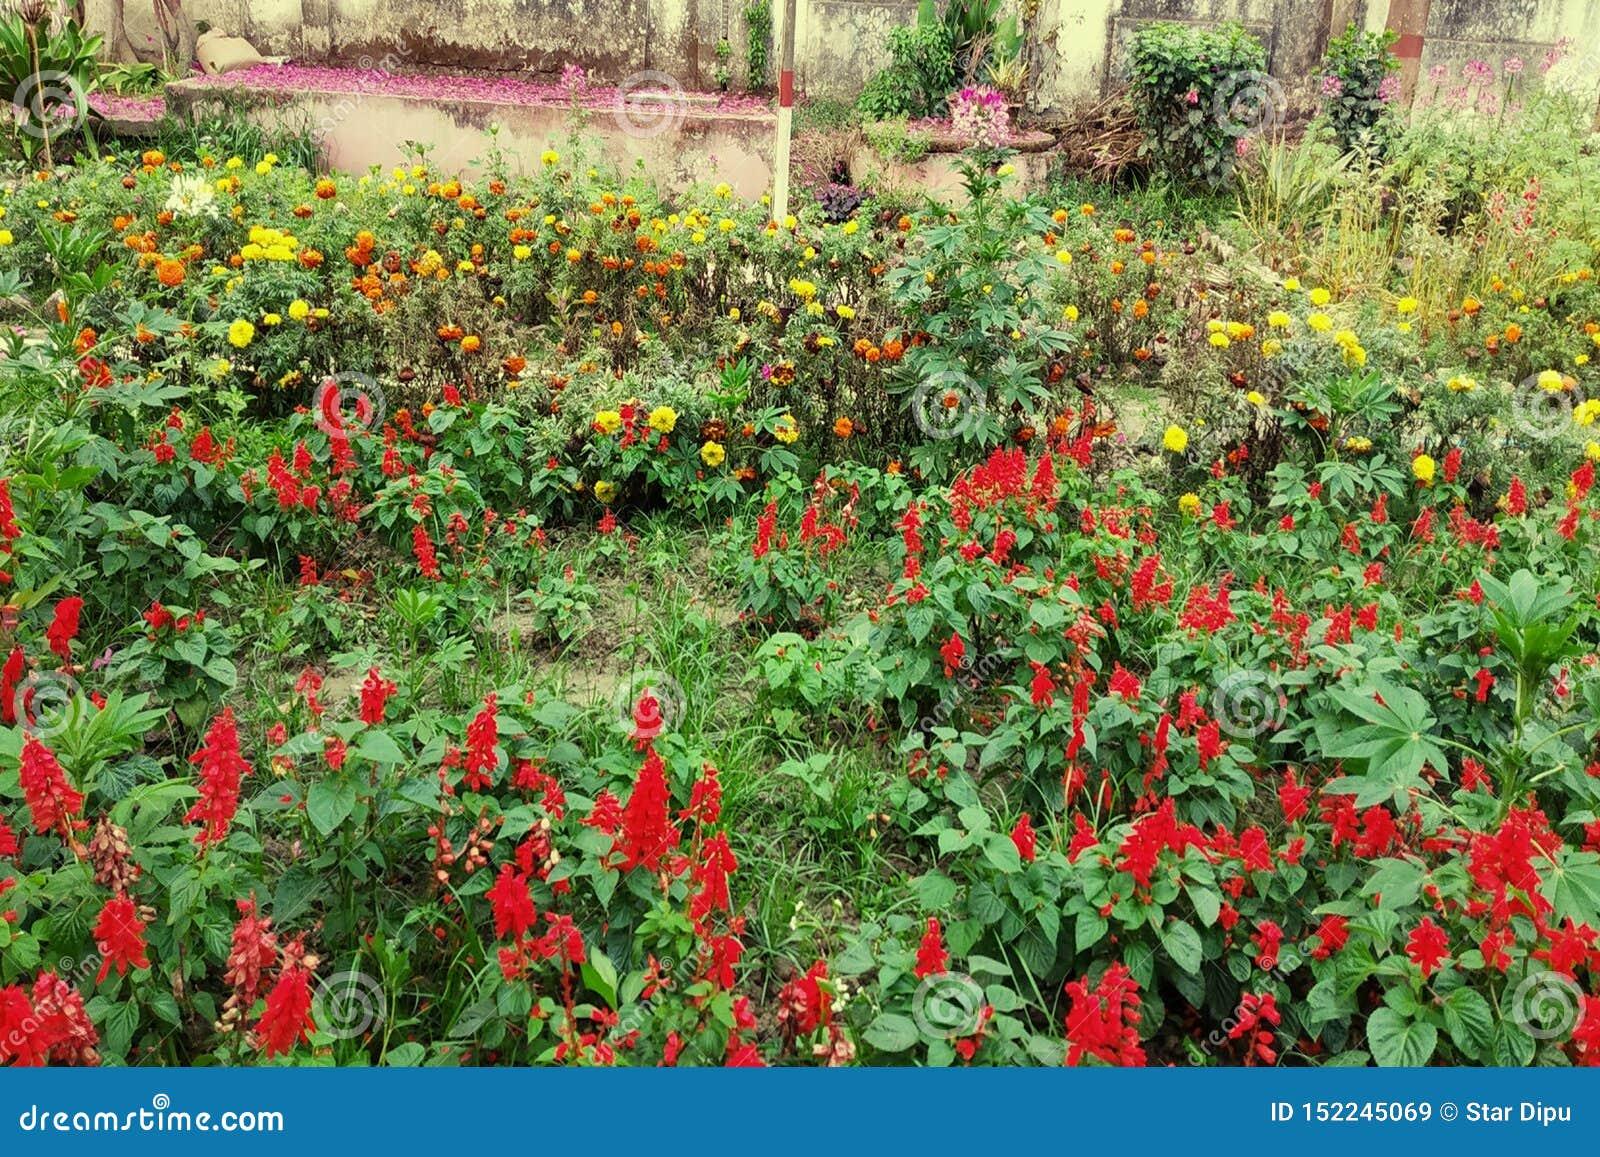 Flowers Garden In The Bangladesh